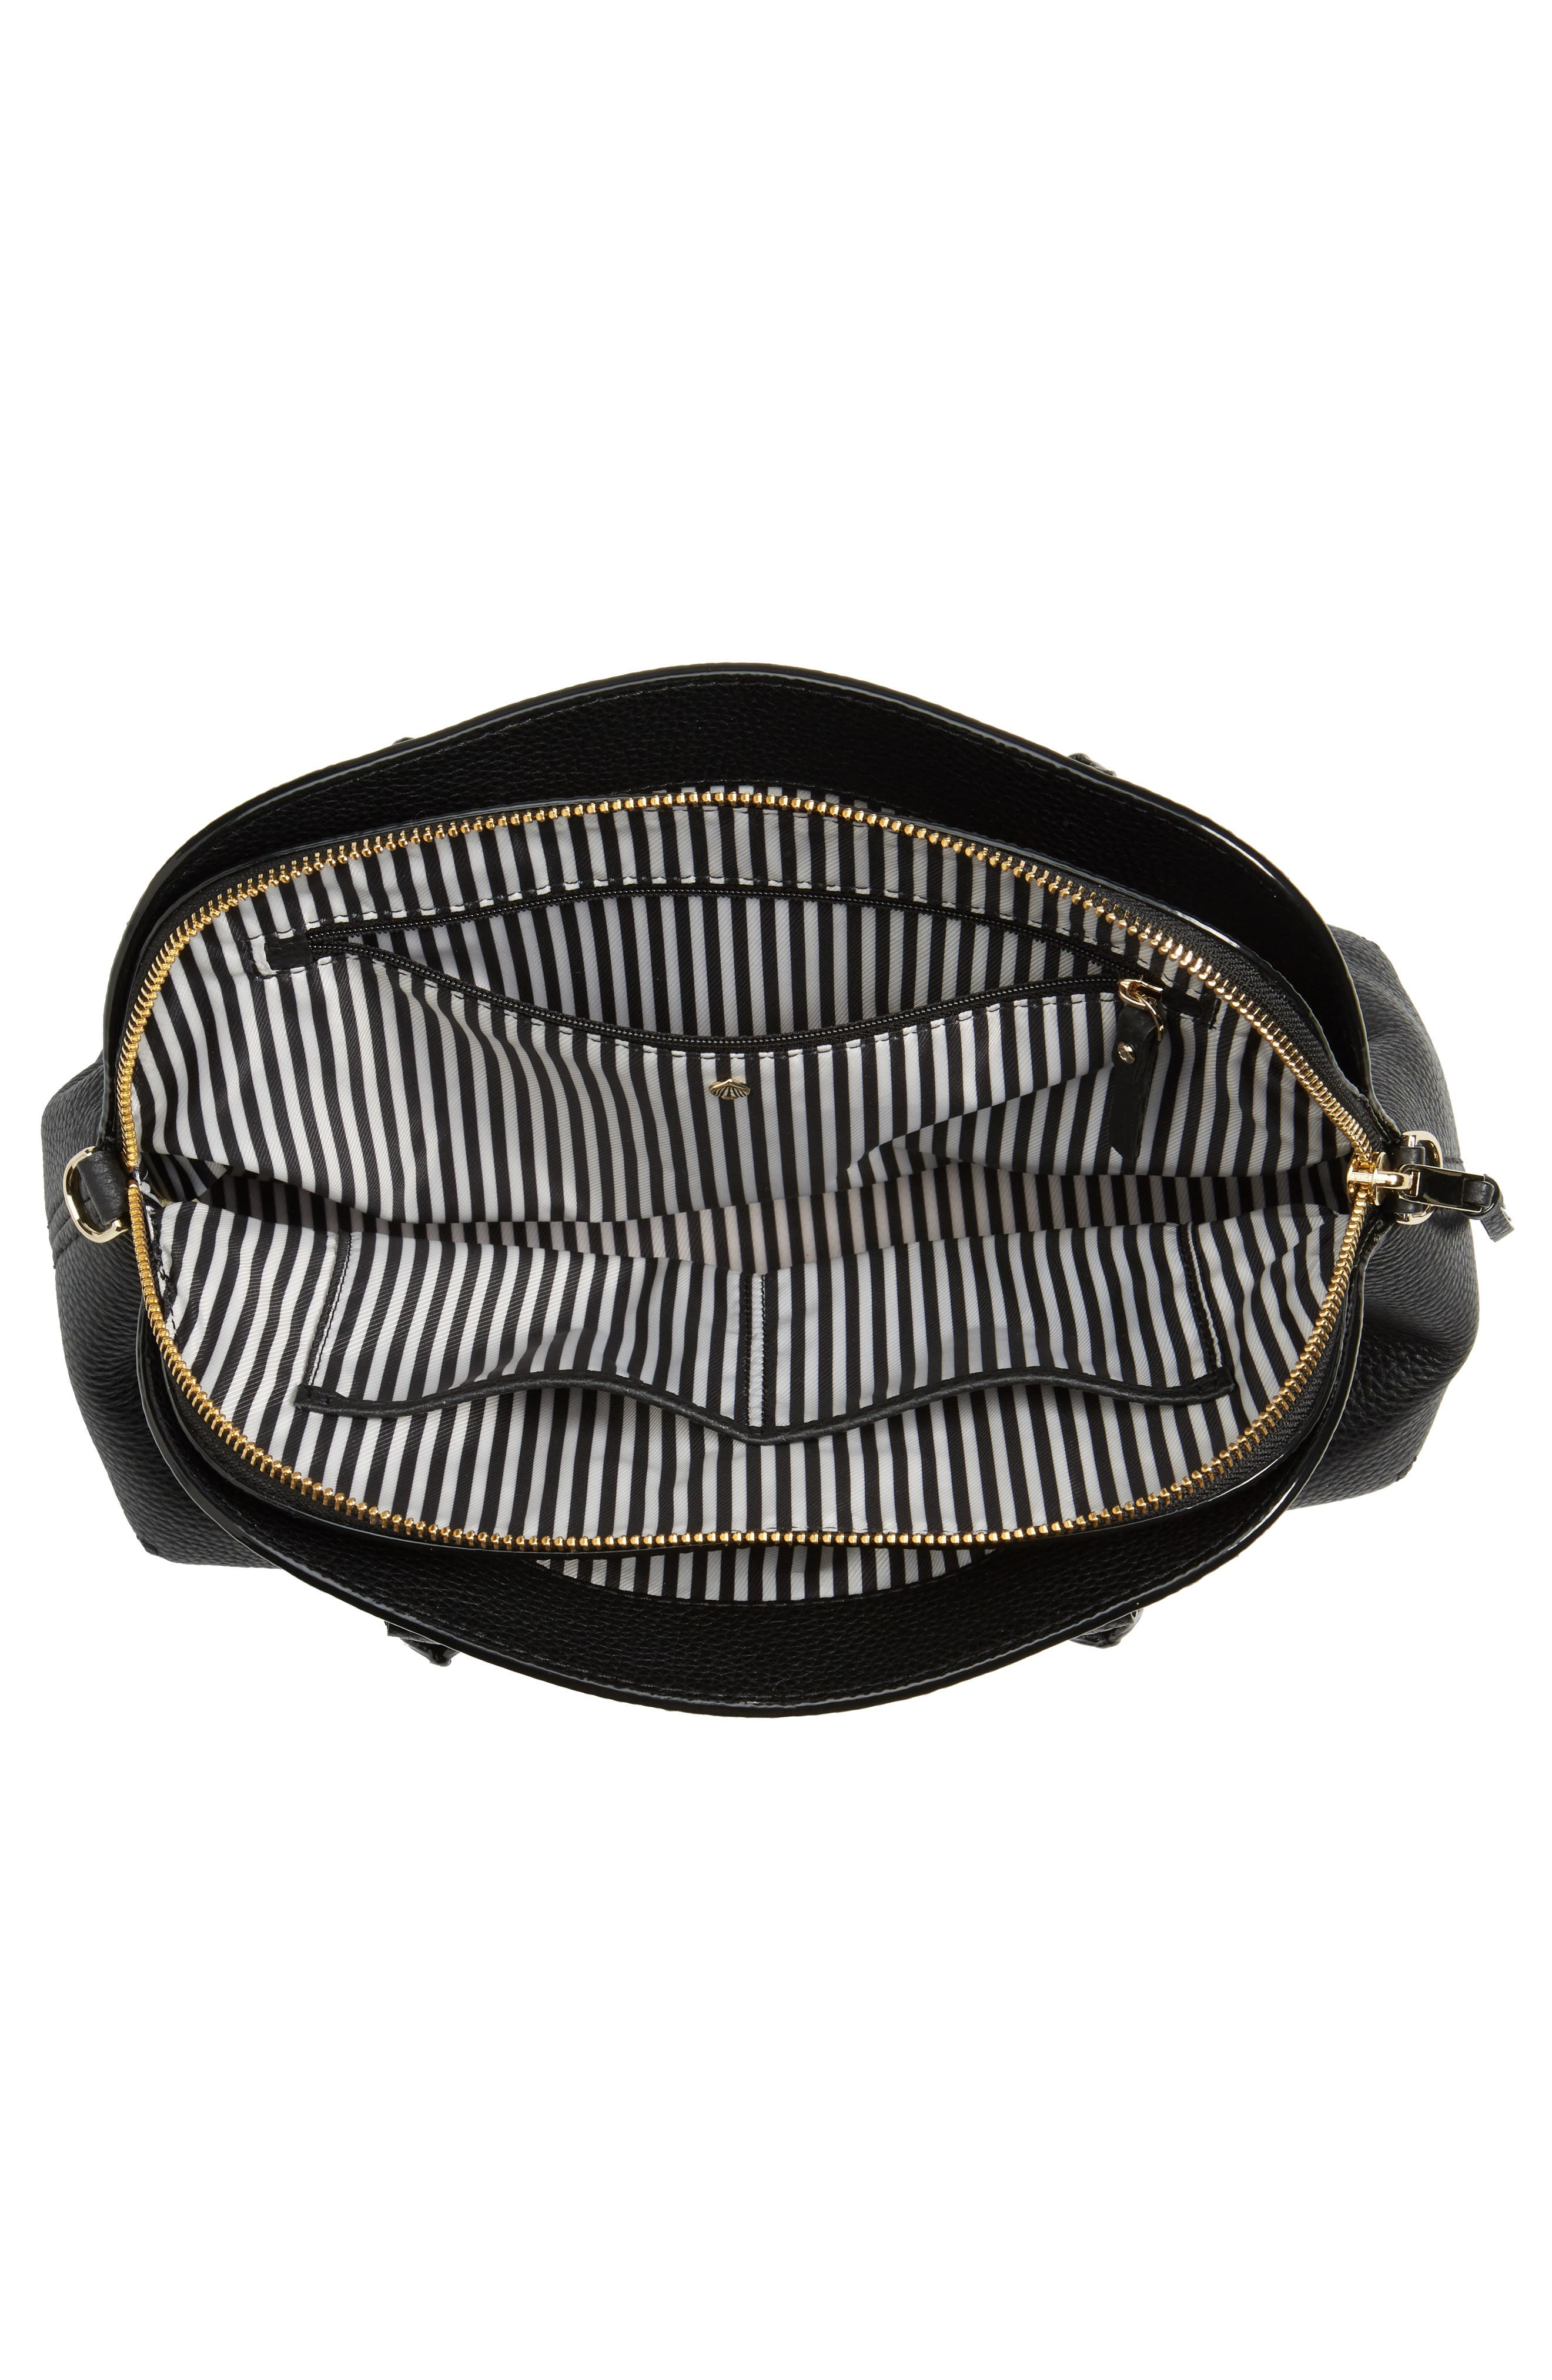 jackson street lottie leather satchel,                             Alternate thumbnail 4, color,                             001